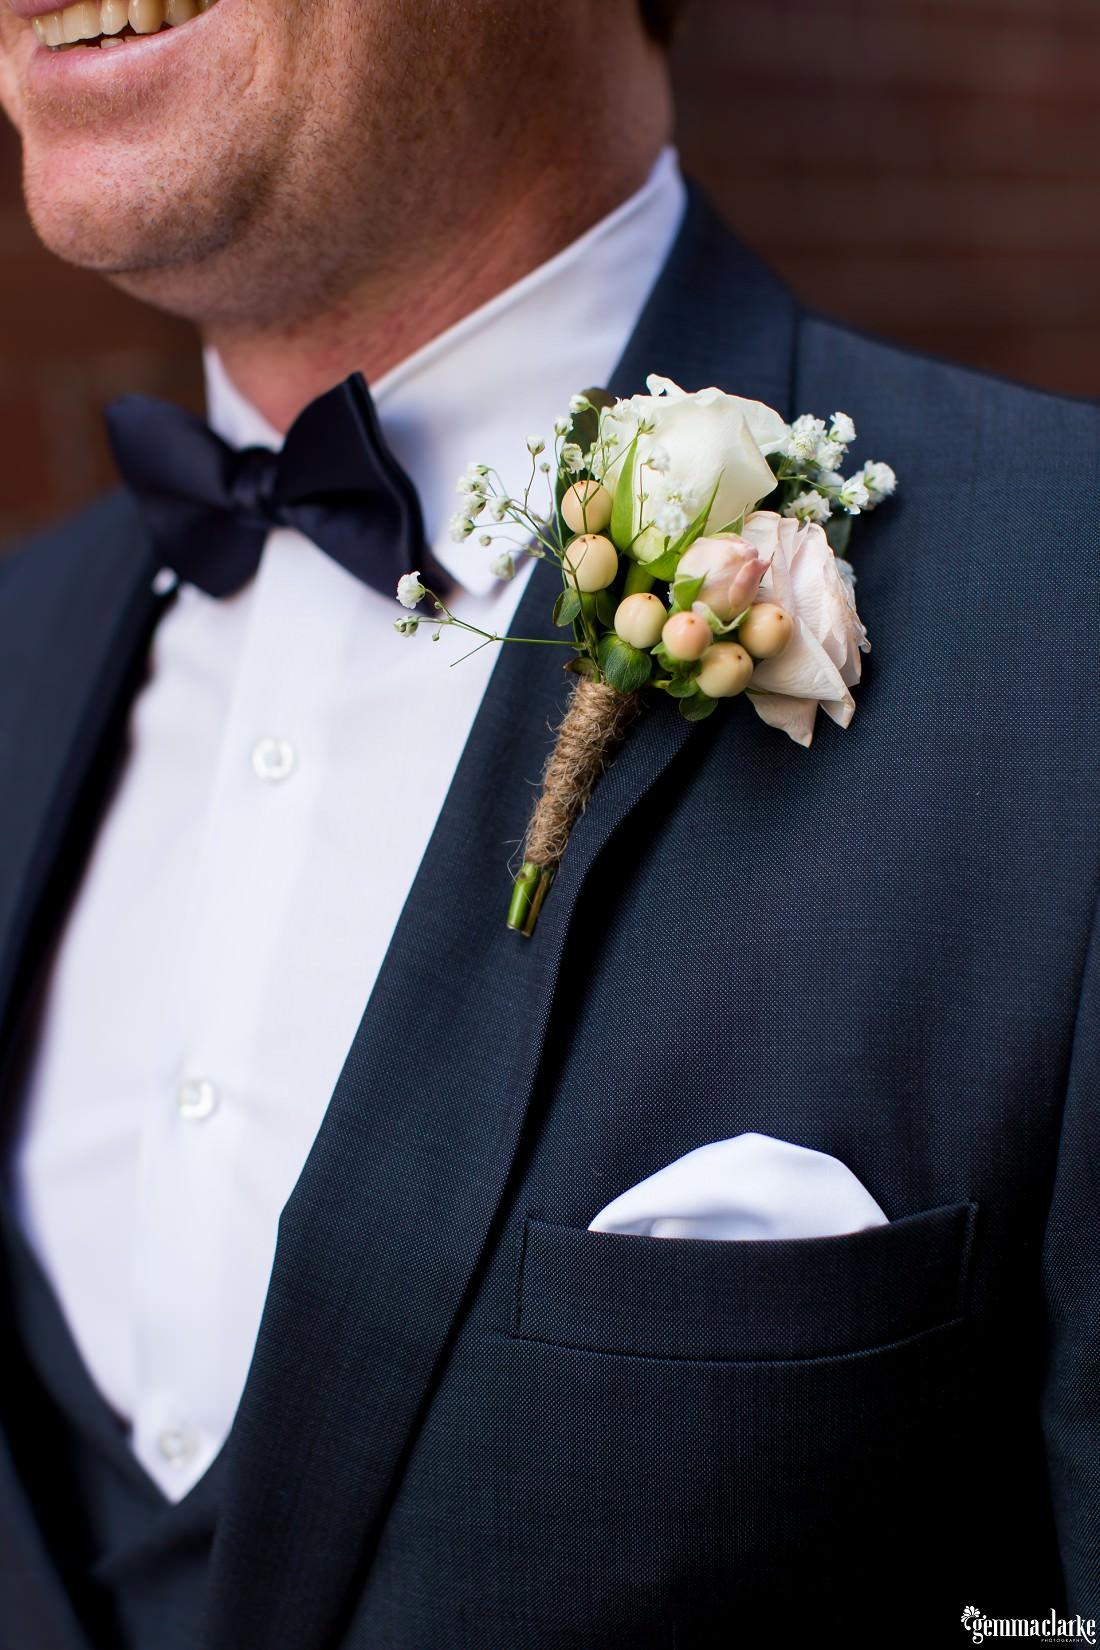 A closeup of a groom's buttonhole flower